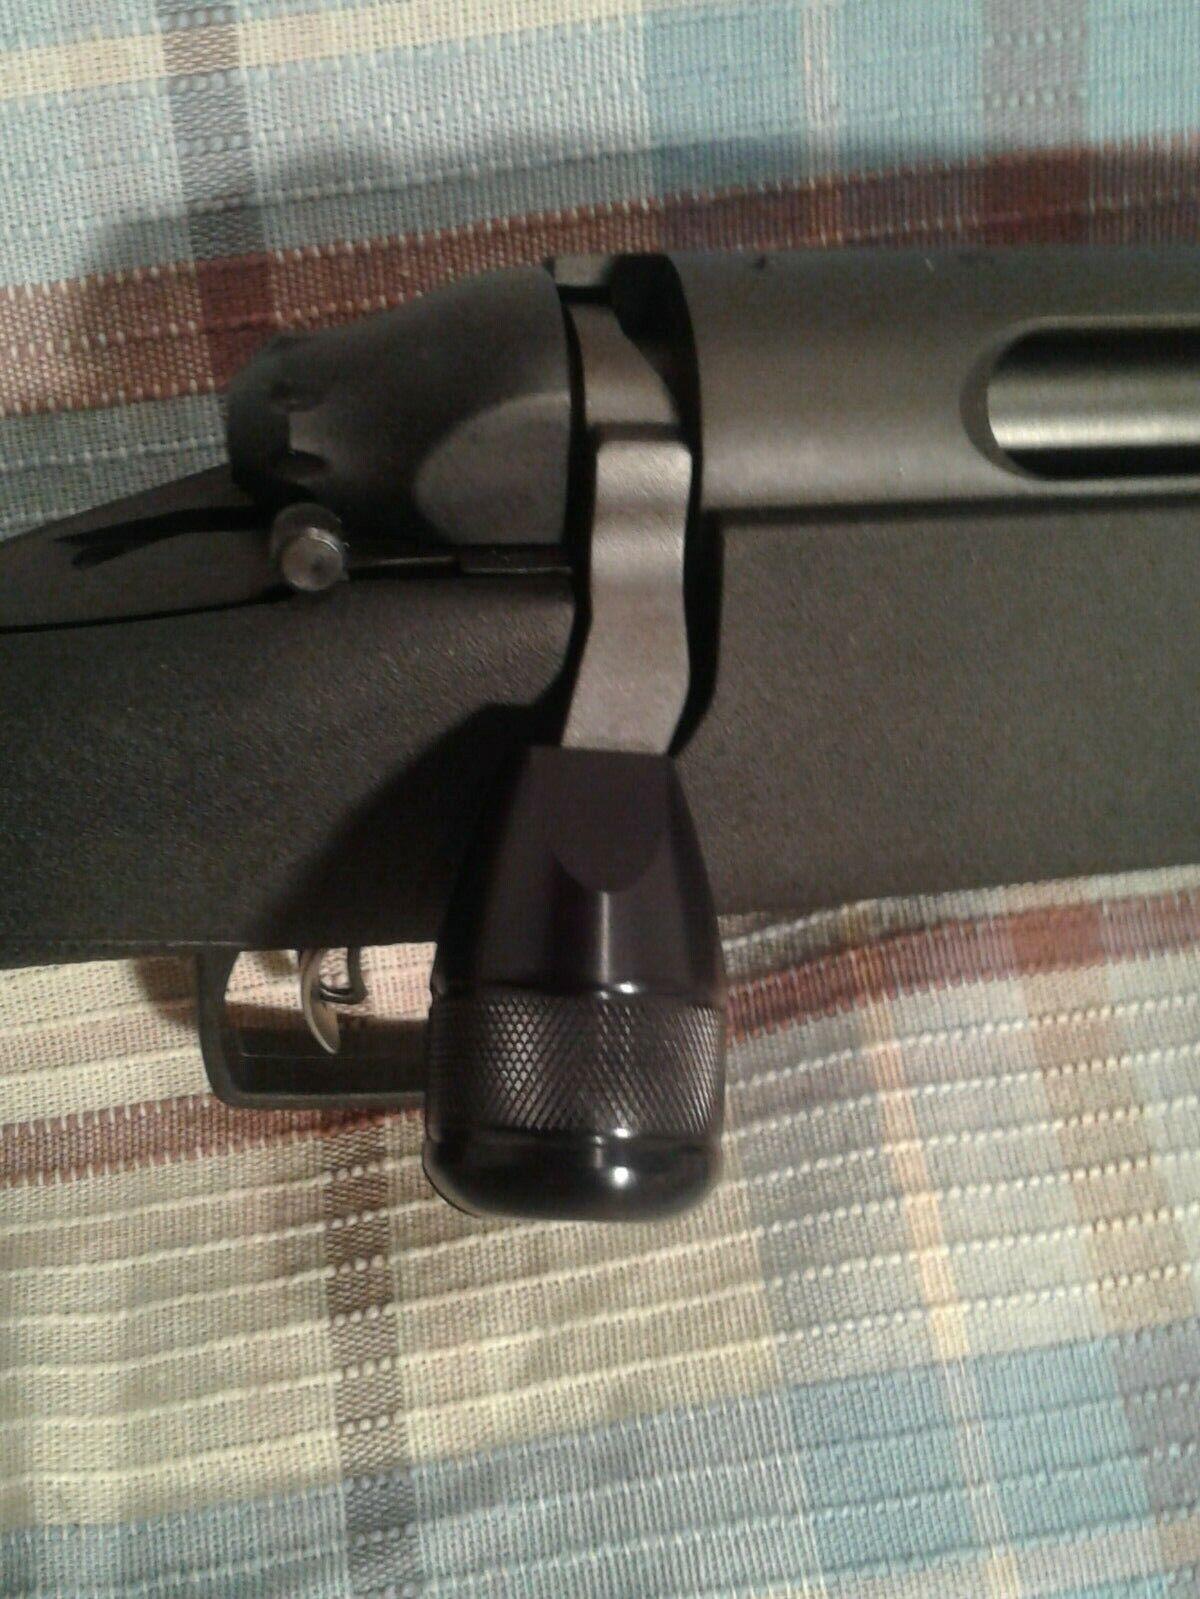 700 black bolt on knob tactical knob